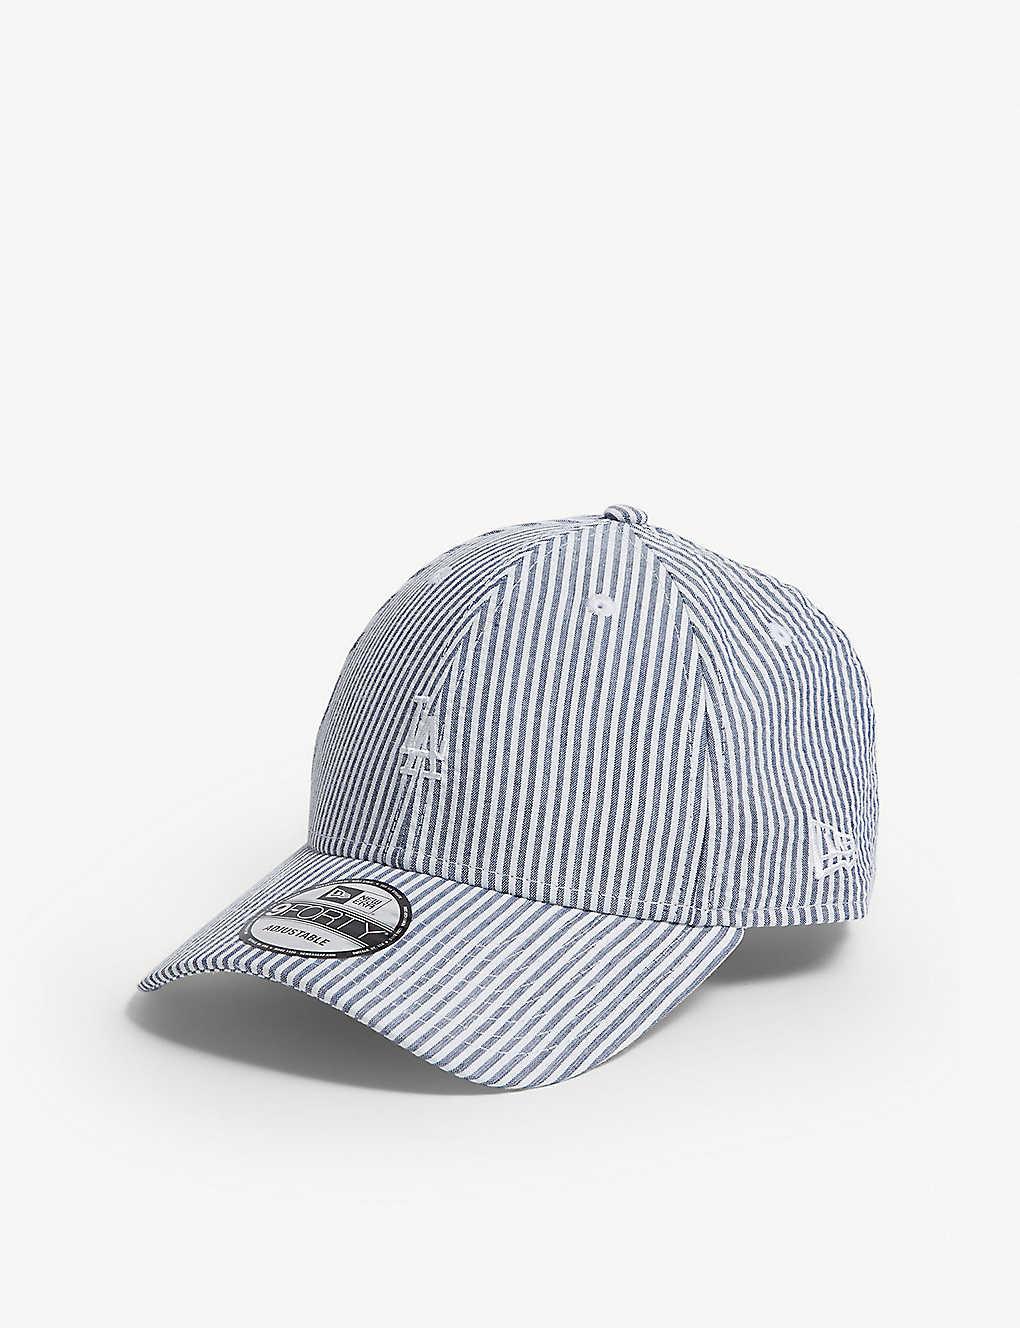 NEW ERA - 9FORTY LA Dodgers seersucker strapback cap  2199f8edd9